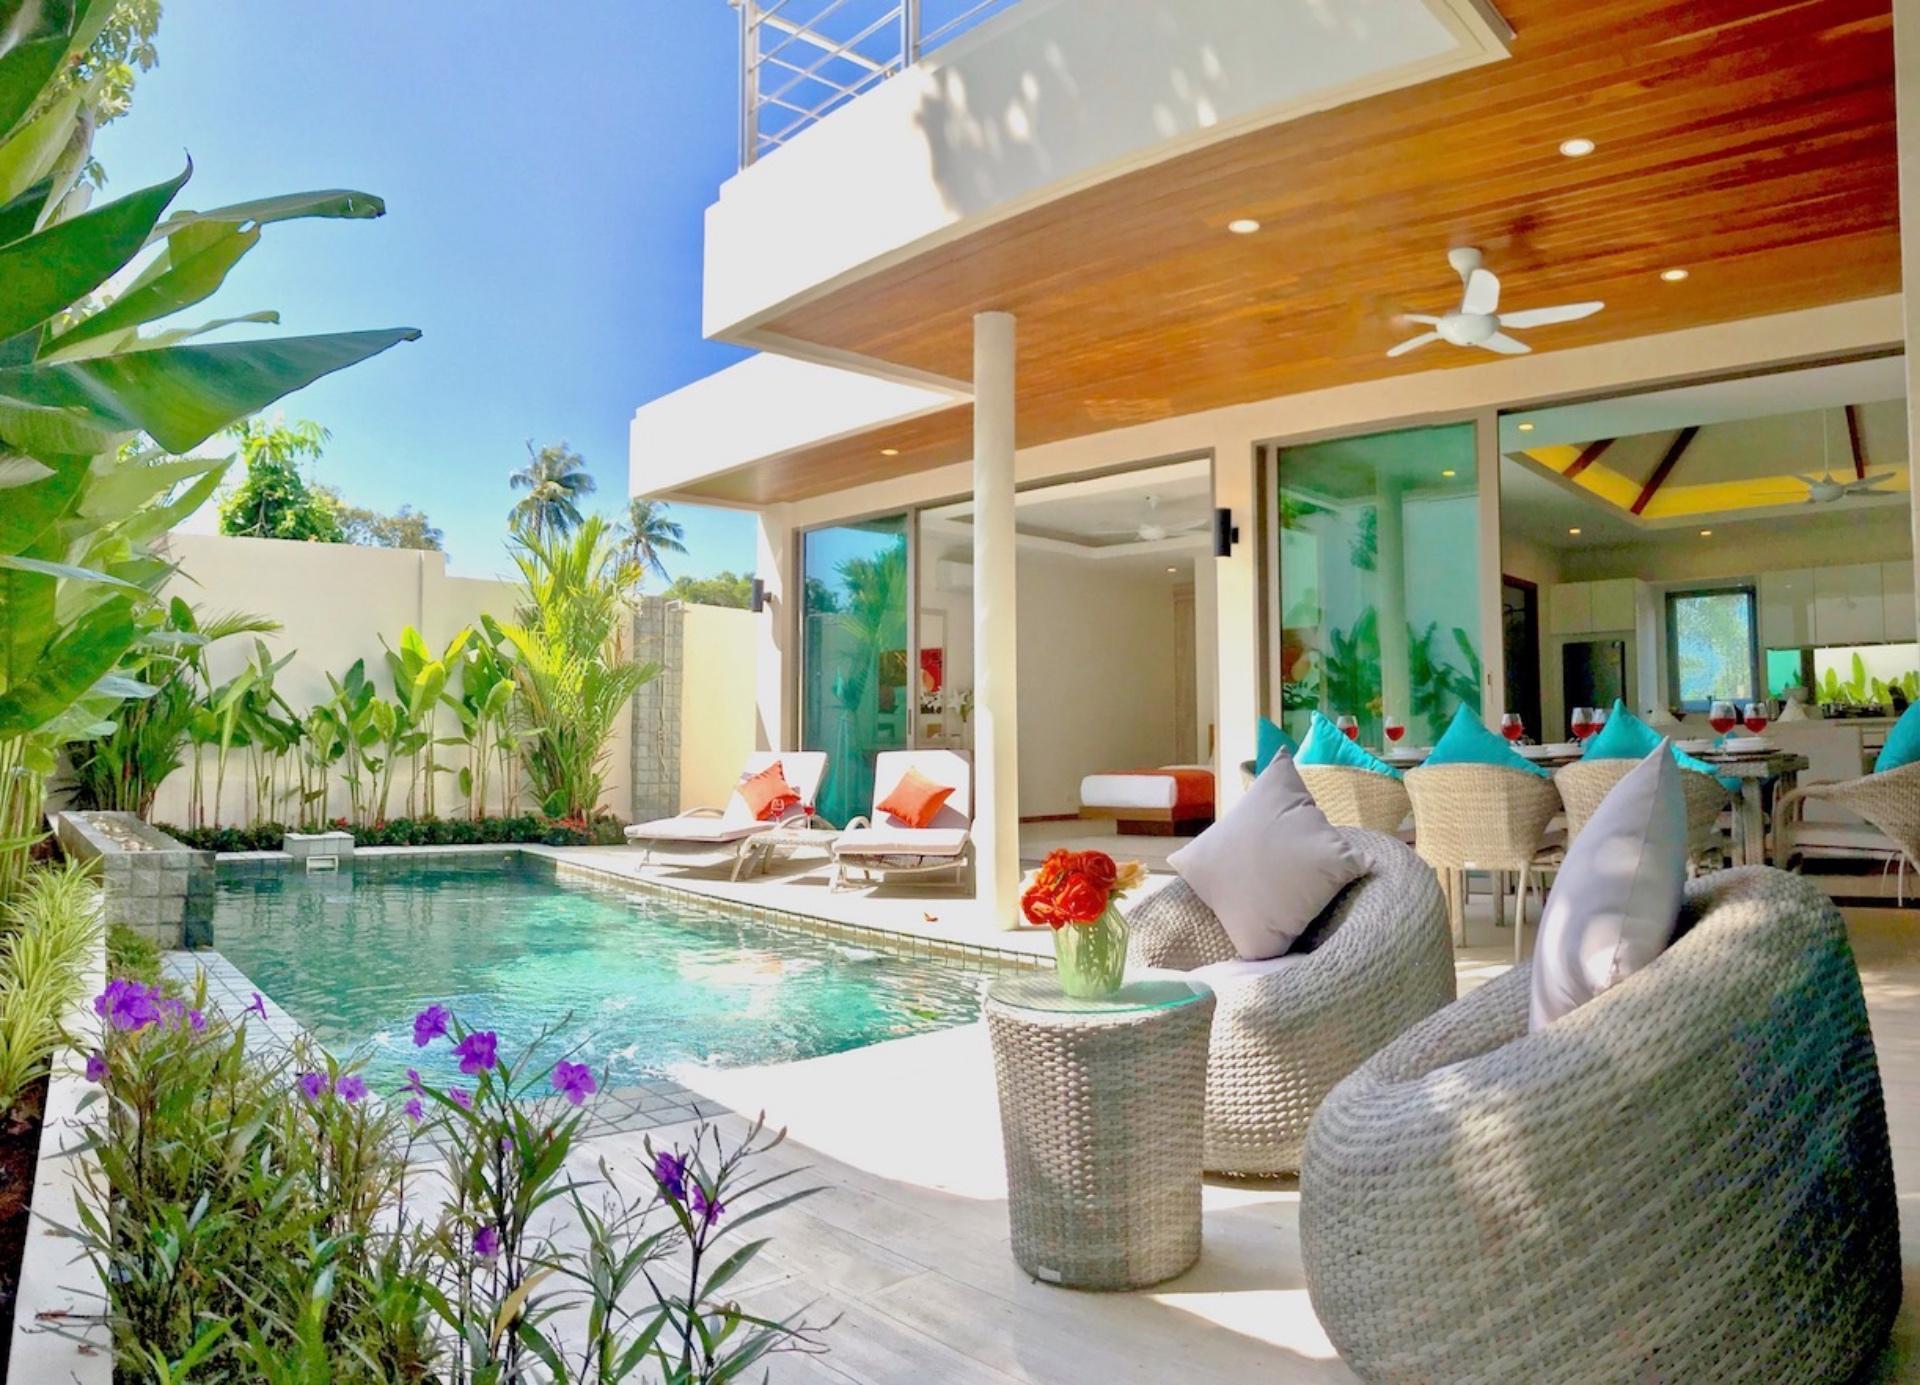 Blissful Pool Villa, Well Located in Rawai วิลลา 4 ห้องนอน 4 ห้องน้ำส่วนตัว ขนาด 252 ตร.ม. – หาดราไวย์